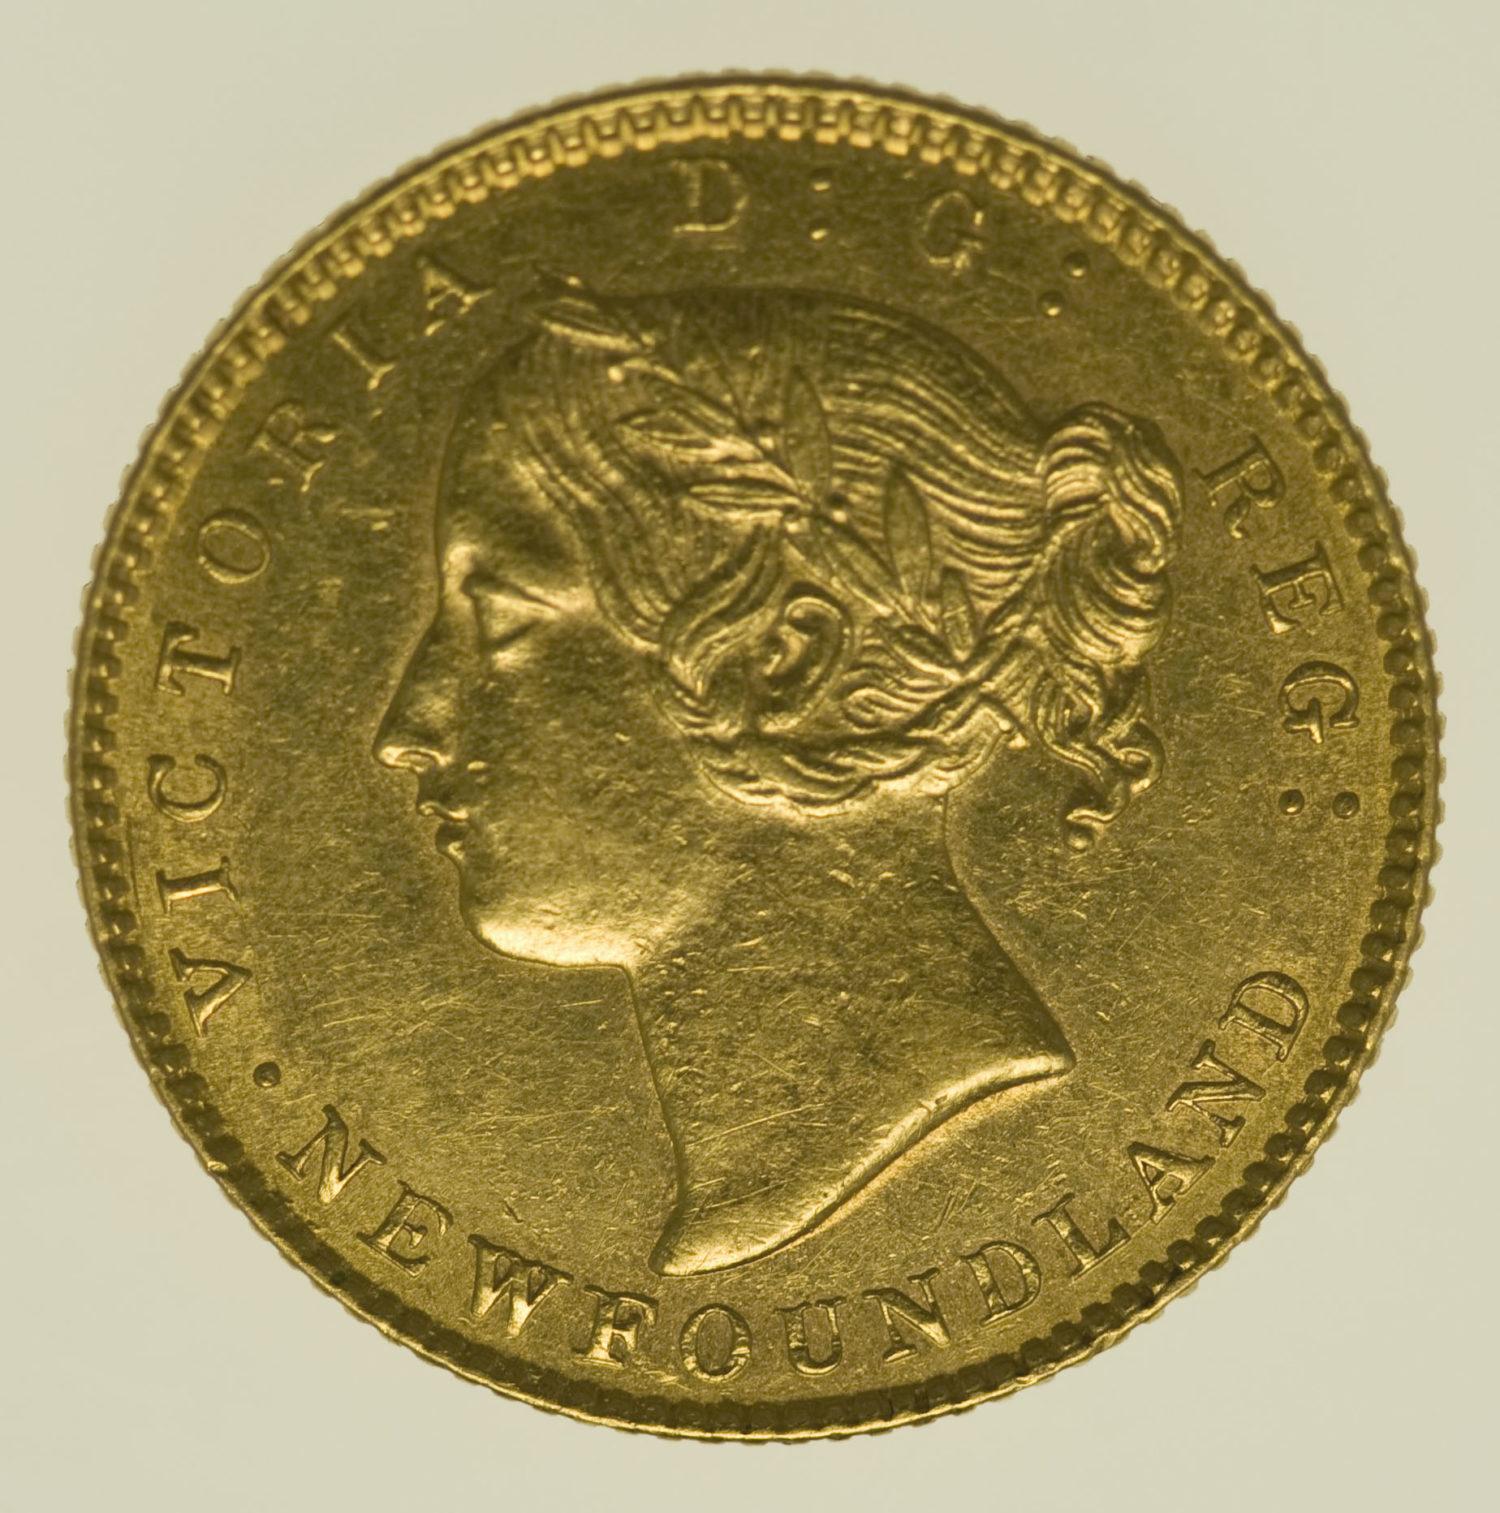 neufundland, kanada - Kanada Neufundland Victoria 2 Dollars 1885